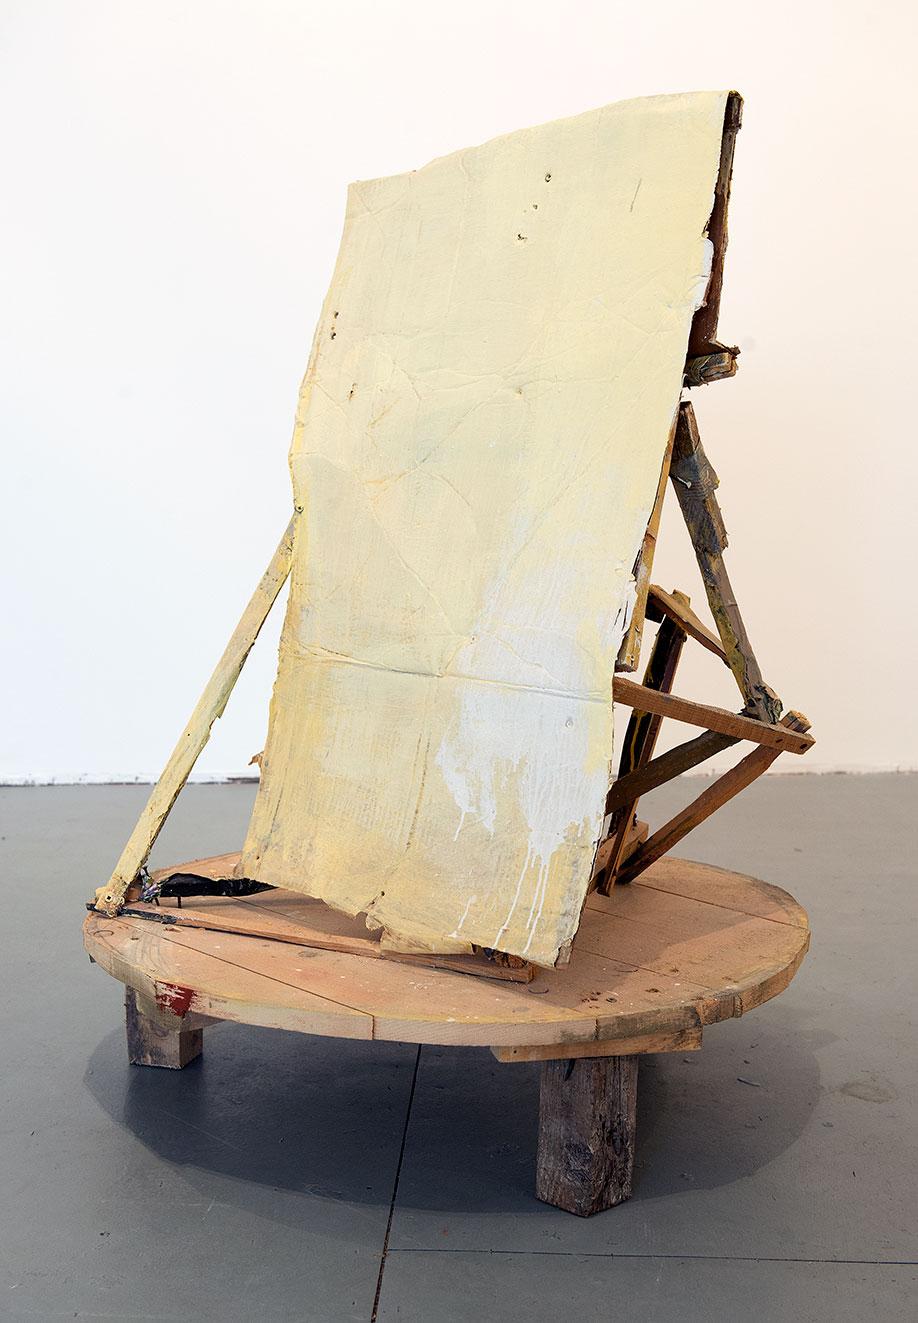 <b>Title:</b>Untitled Table Painting, Yellow<br /><b>Year:</b>2008<br /><b>Medium:</b>Oil, housepaint, cardboard, and wood <br /><b>Size:</b>107 x 80 x 80 cm